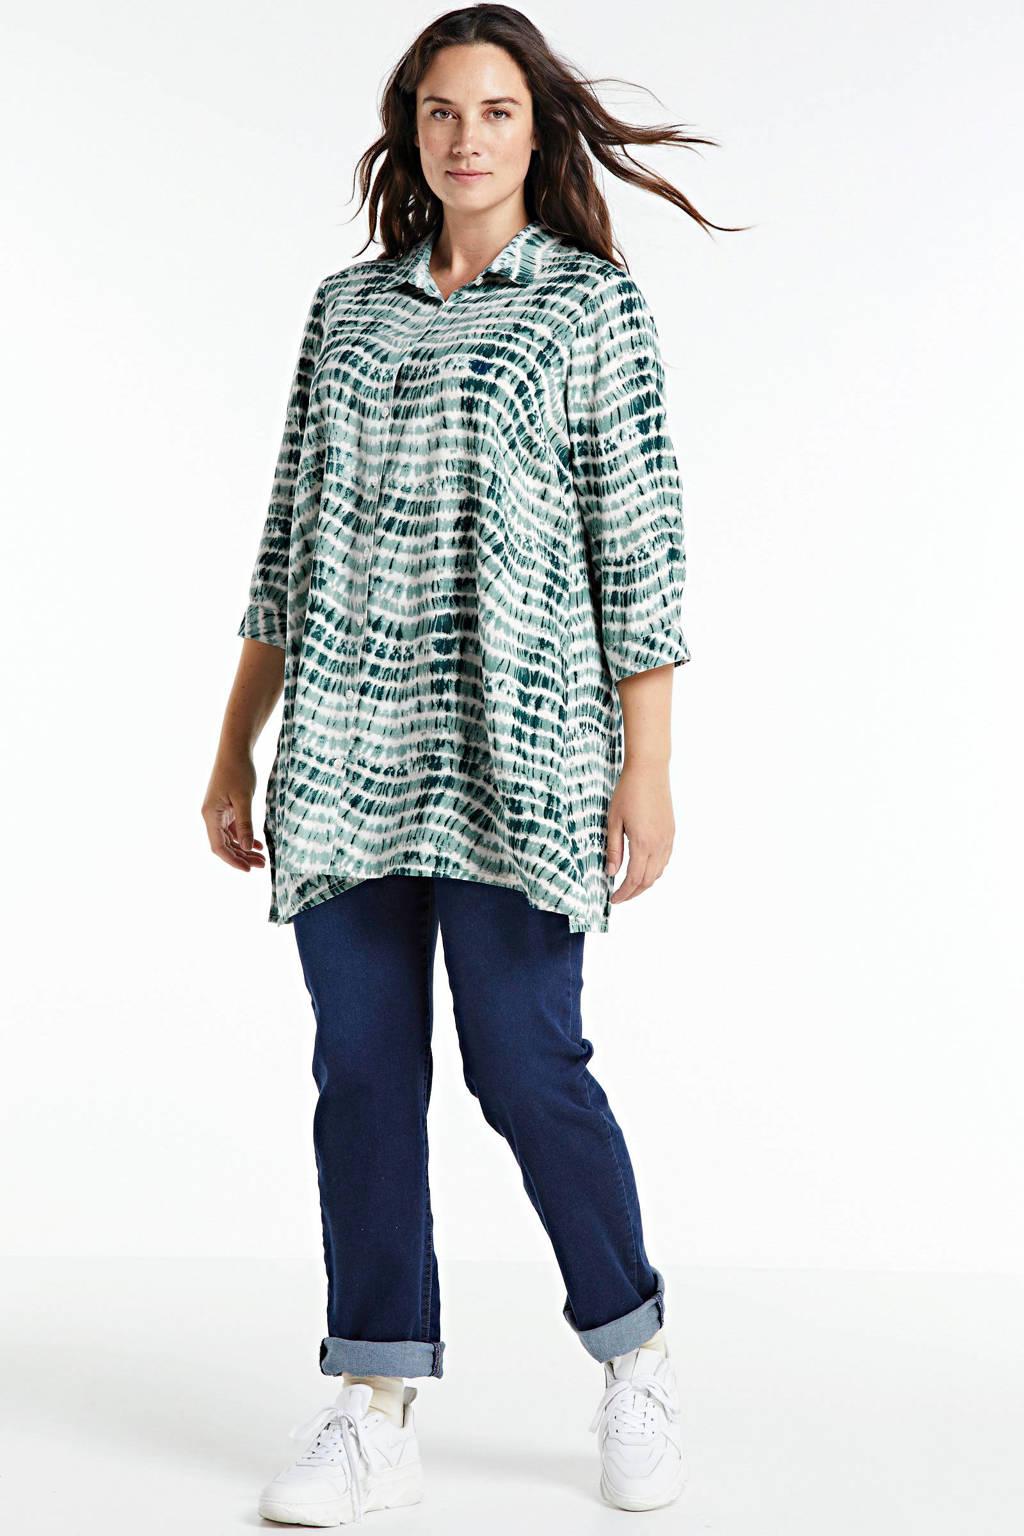 Zhenzi tie-dye blouse KRUS 545, Lichtblauw/donkerblauw/wit